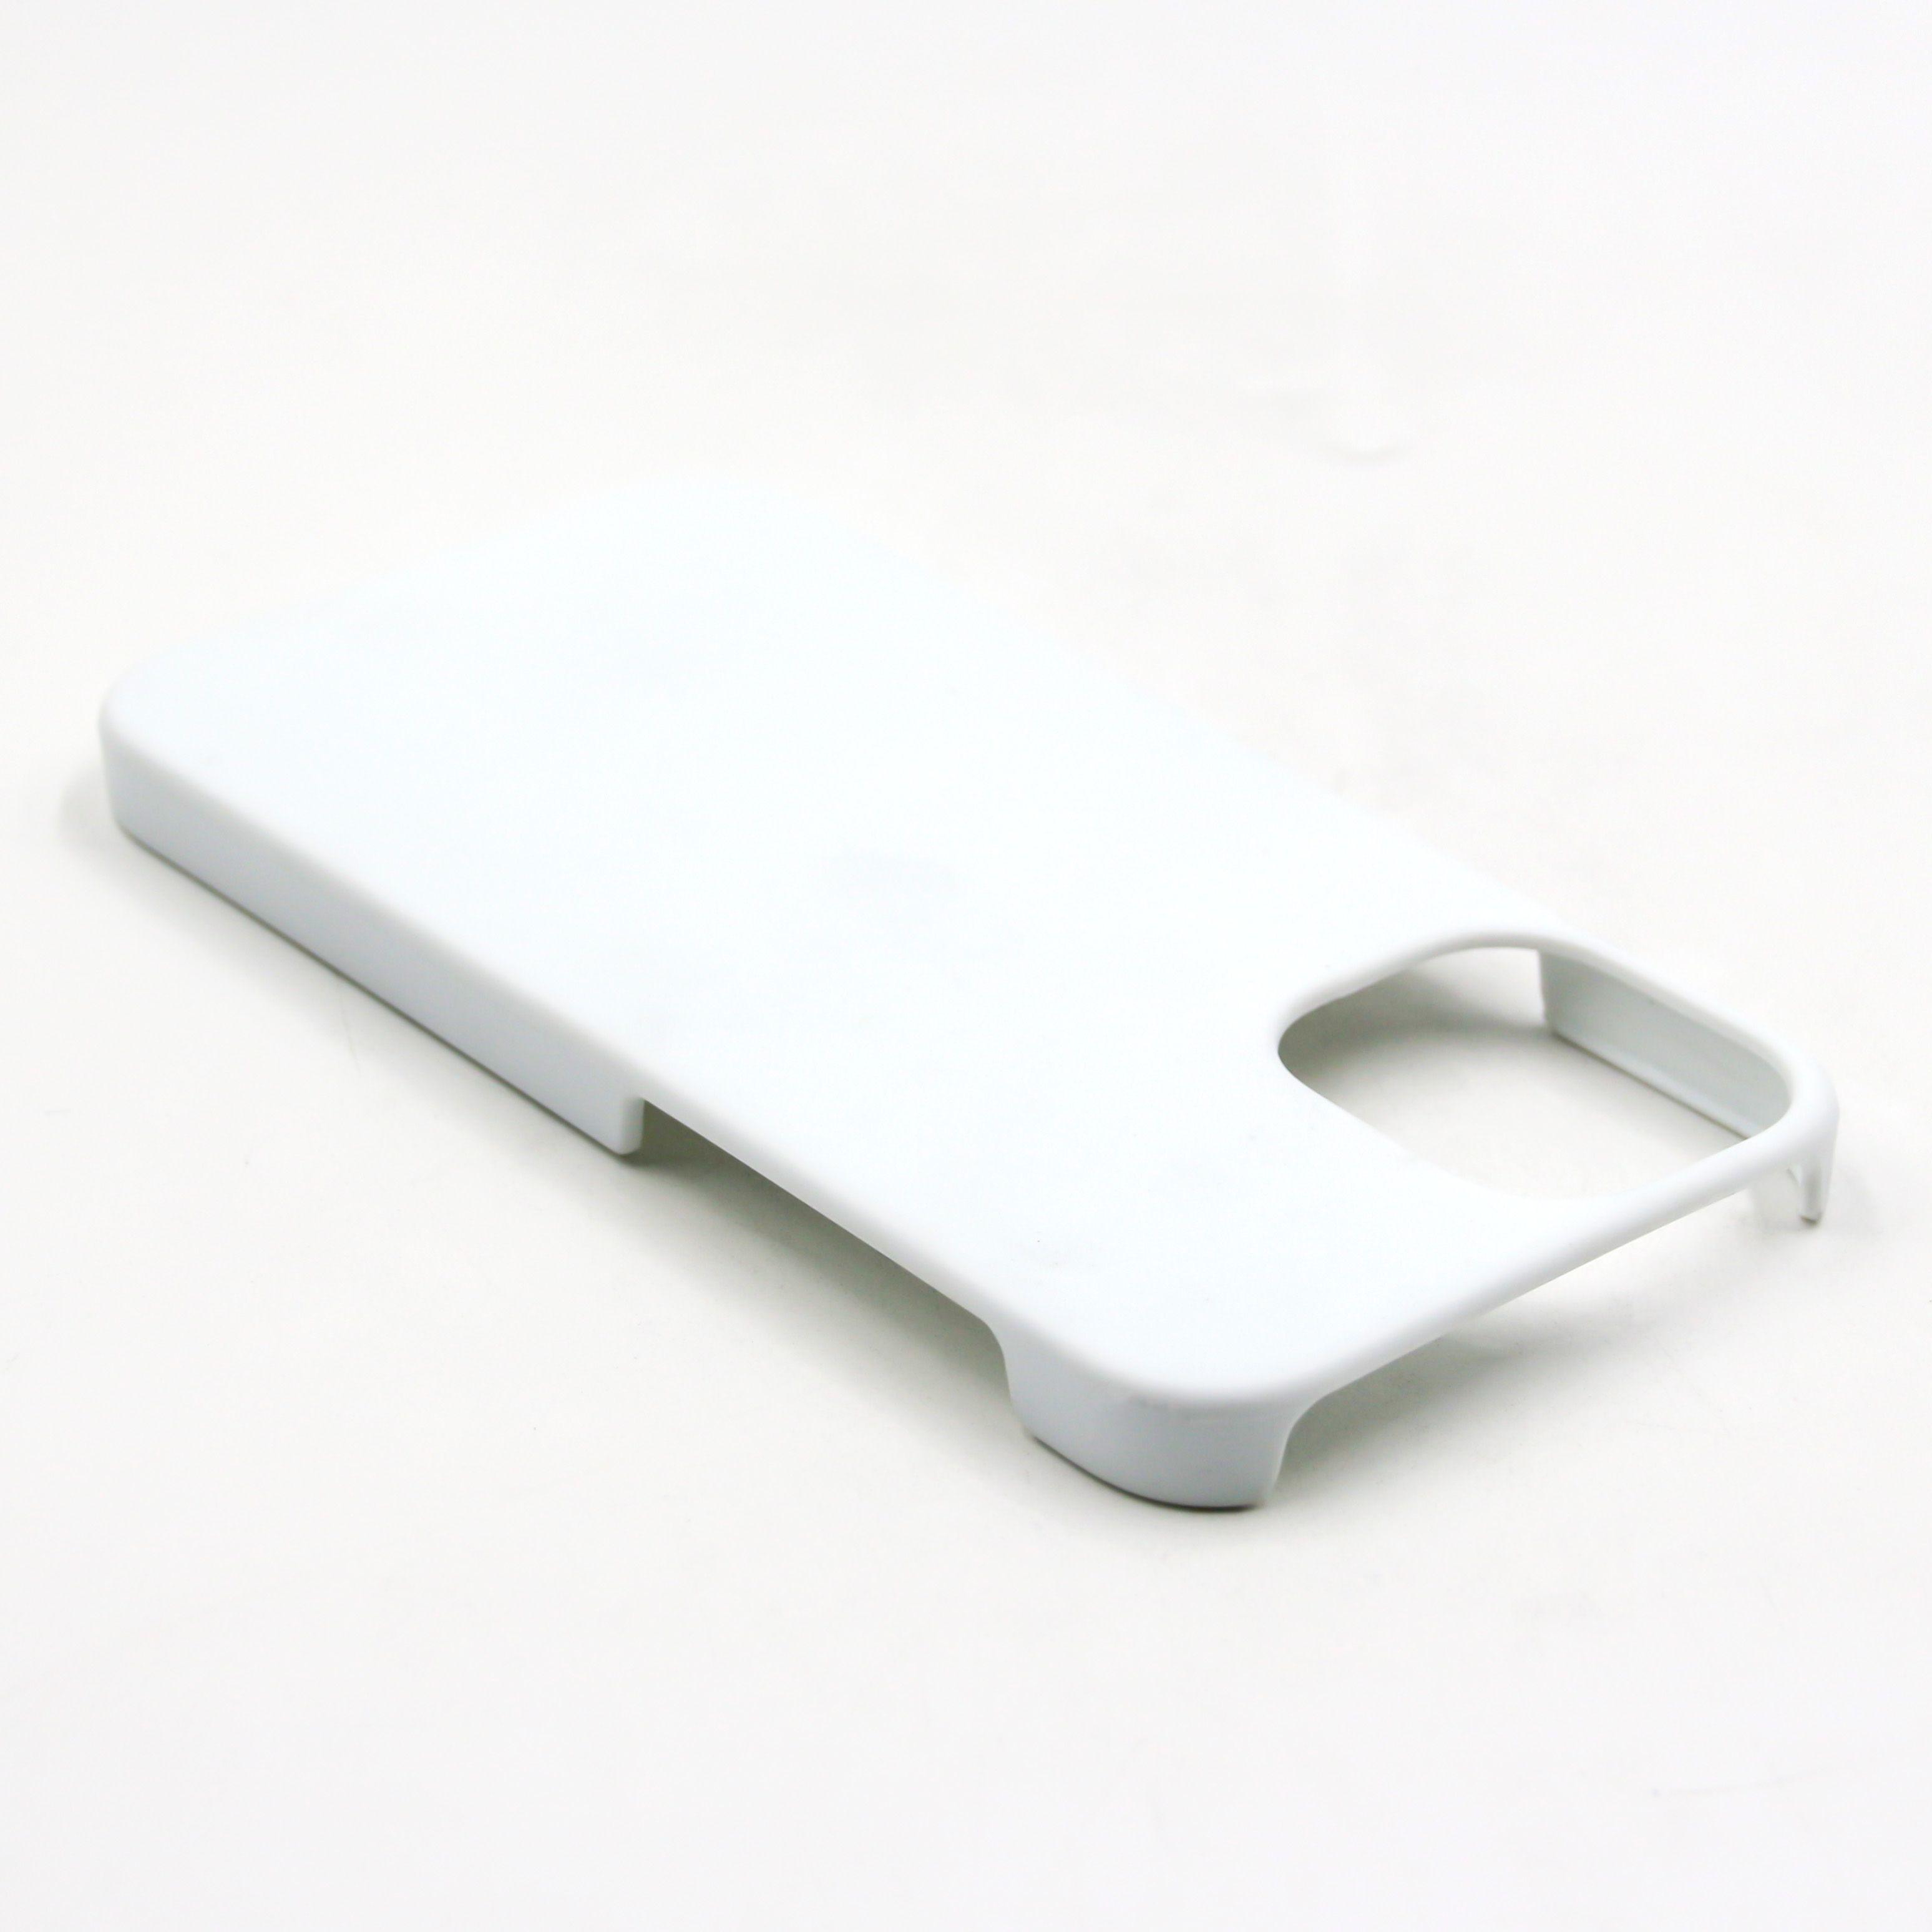 DIY 3D حالة التسامي فارغة تغطية مساحة كاملة مطبوعة آيفون 13 ميني 11 12 برو ماكس x XR XS SE 6 6S 7 8 زائد 100pcs